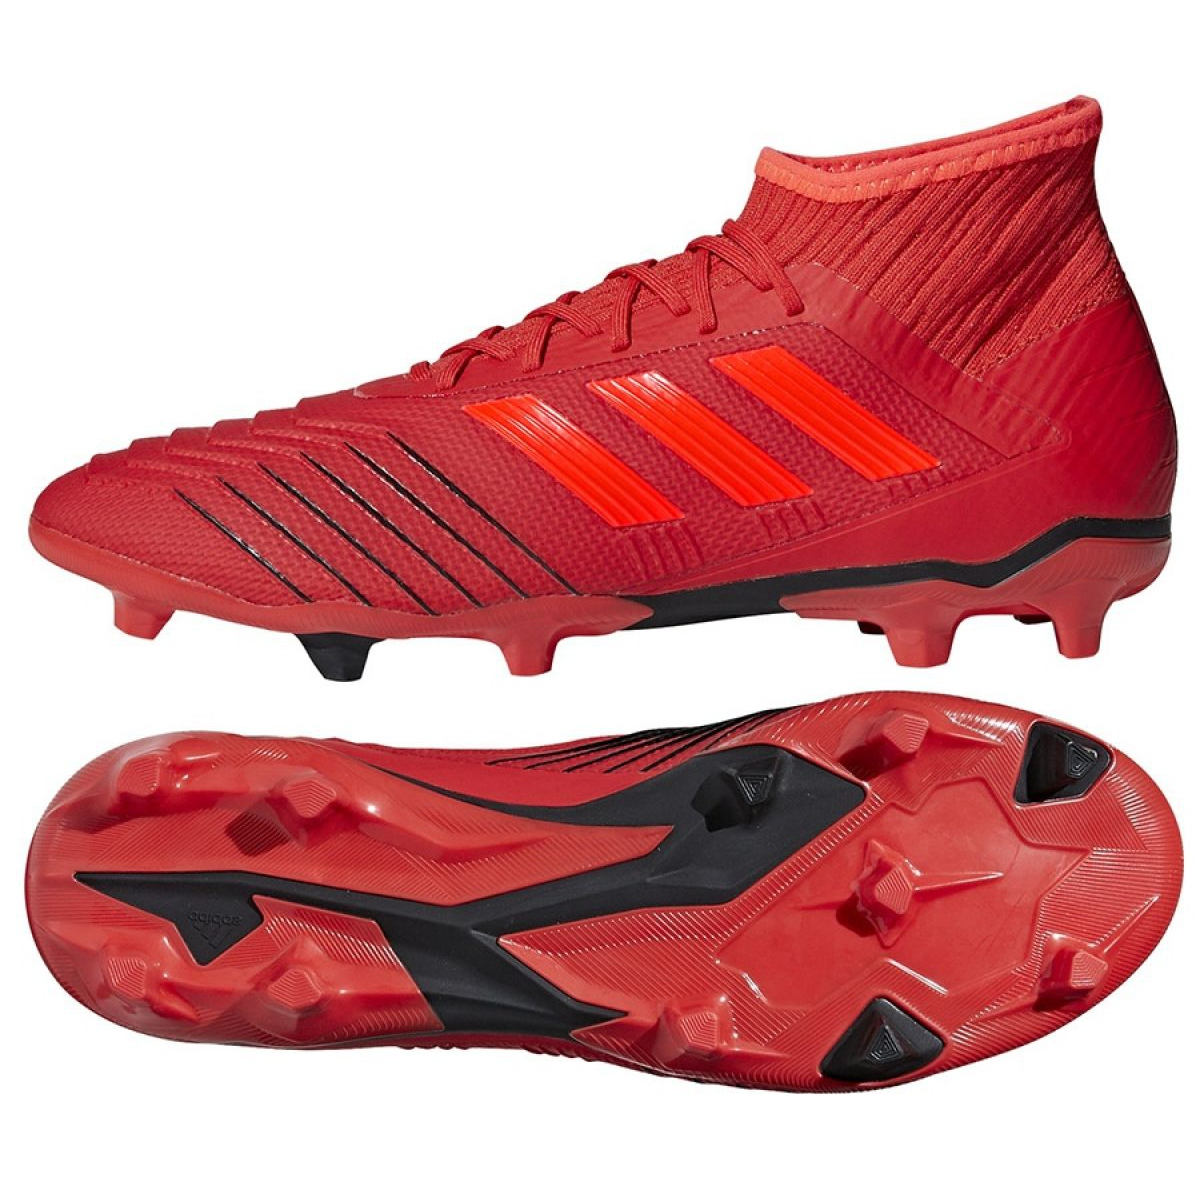 bosque Aventurarse Teoría establecida  Football boots adidas Predator 19.2 Fg M D97940 multicolored - ButyModne.pl